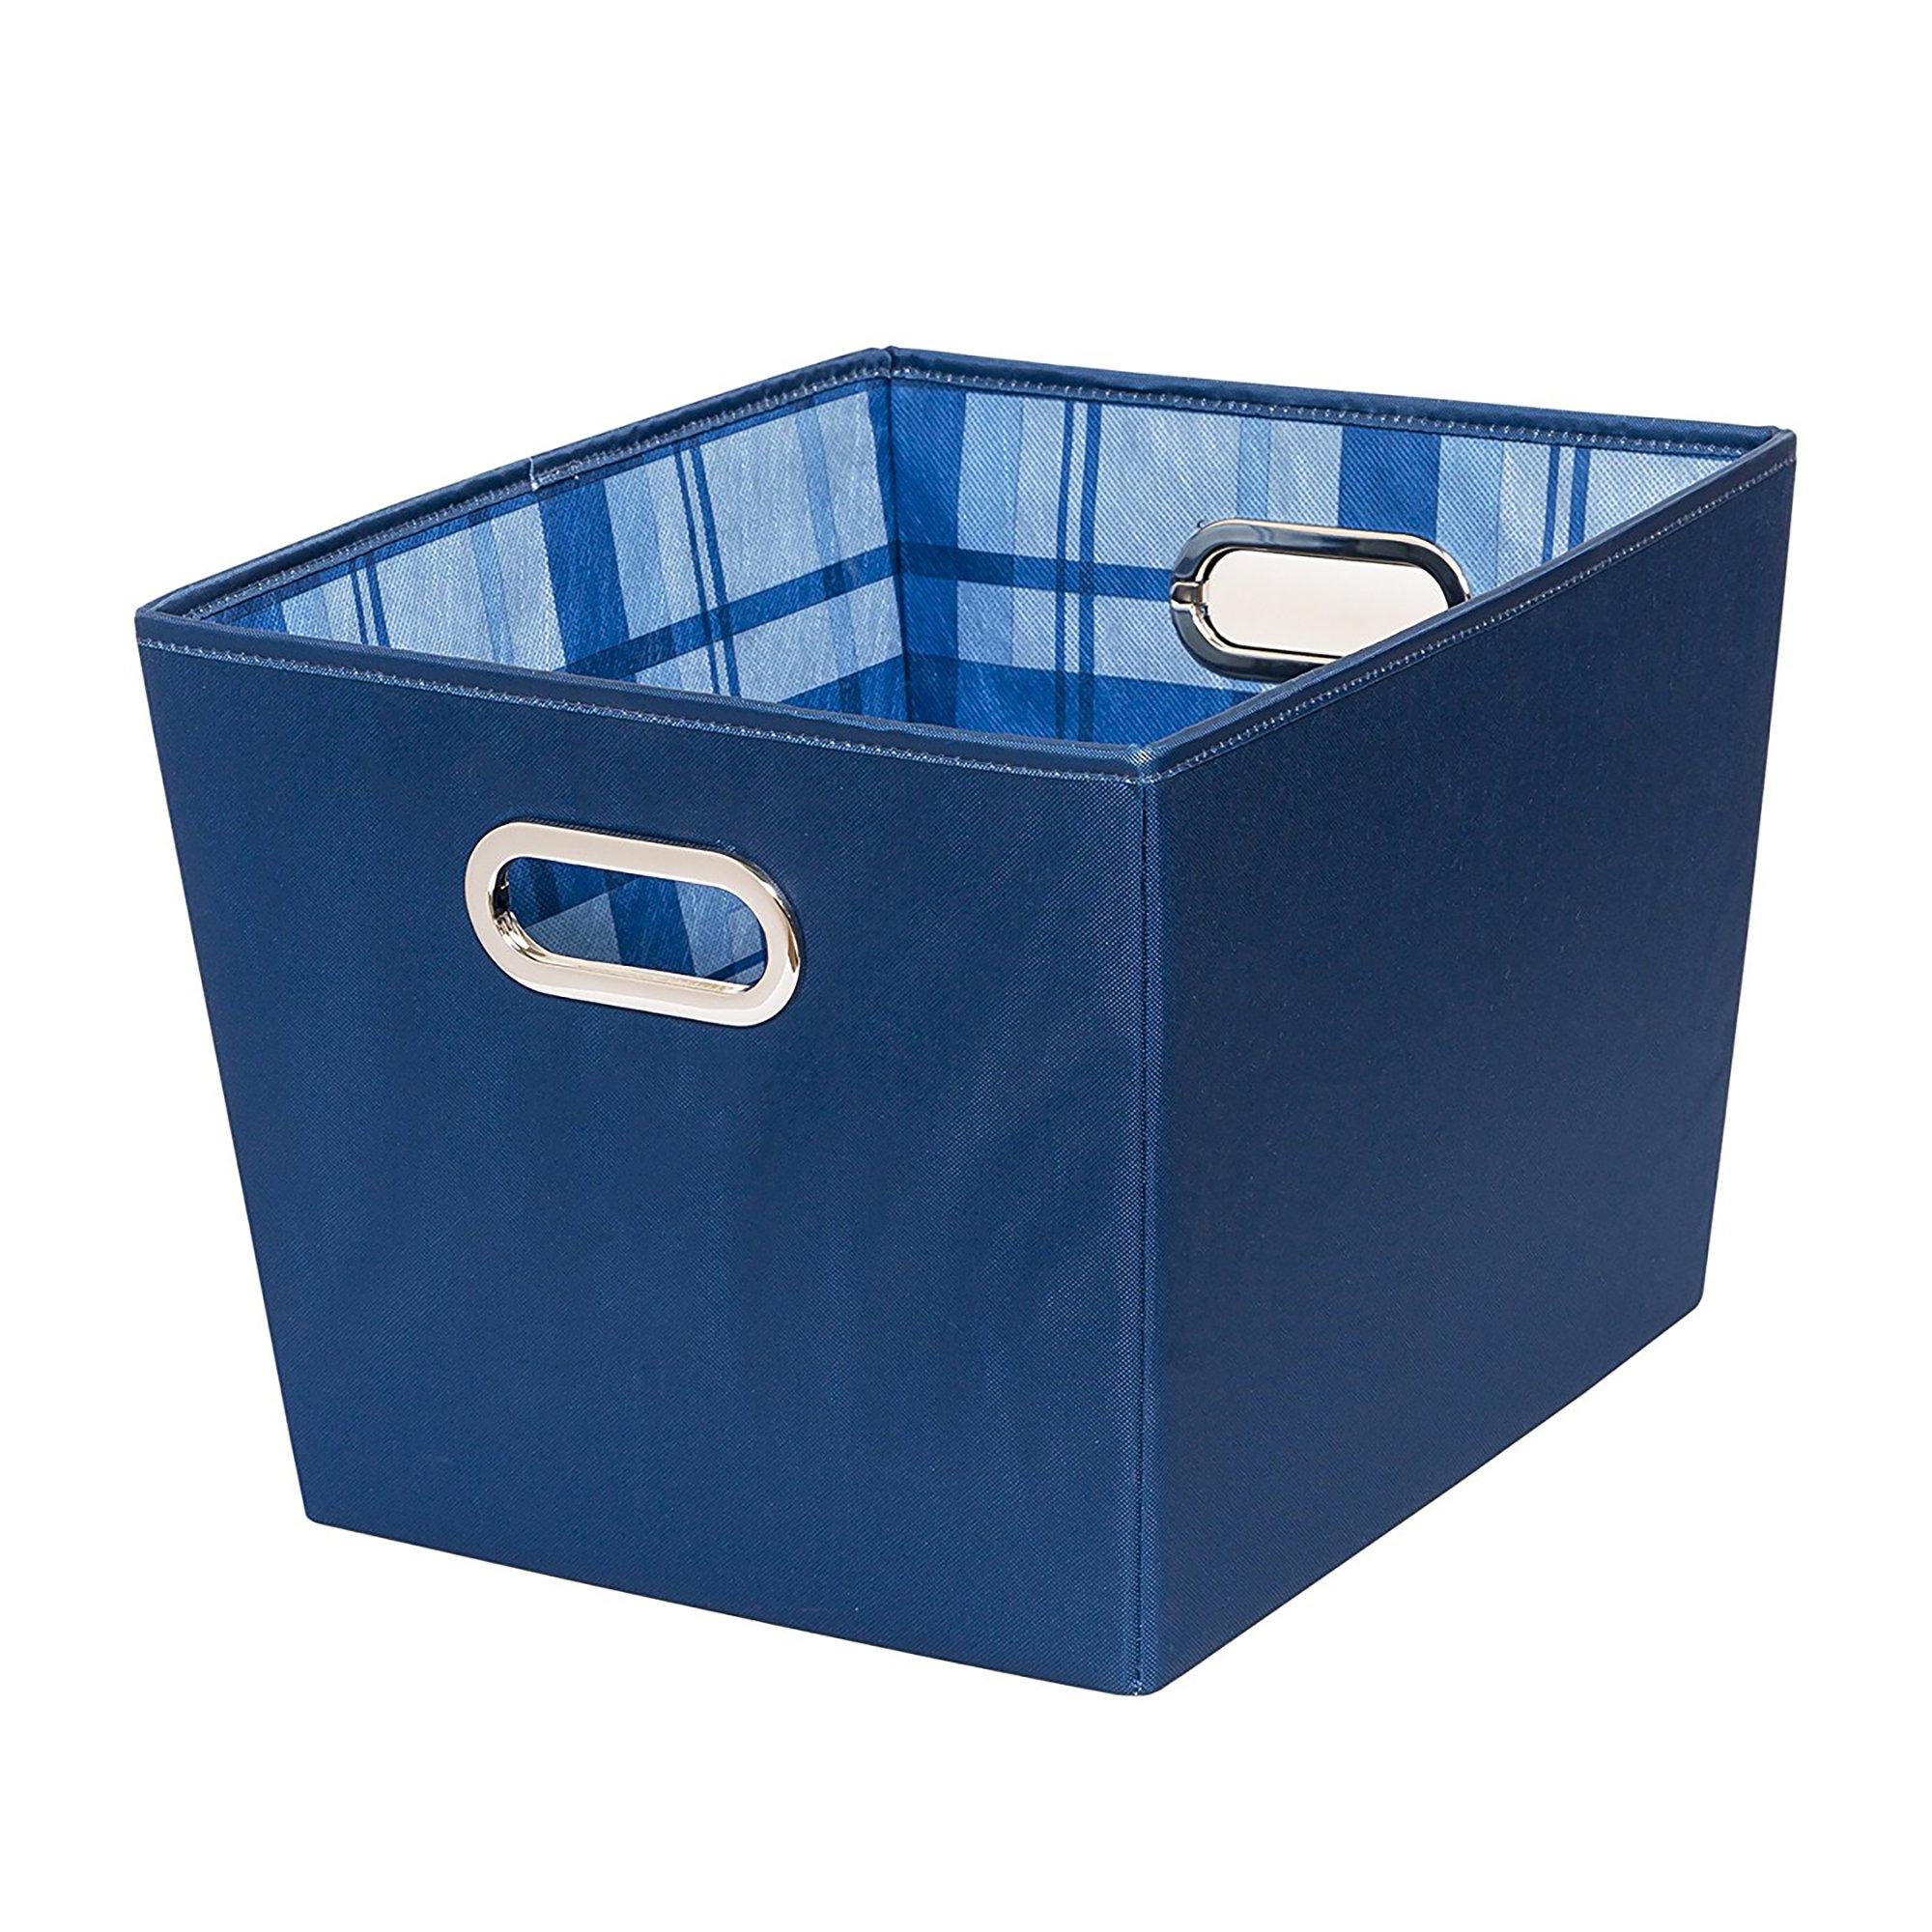 372c8a88787c Fabric Storage Bins